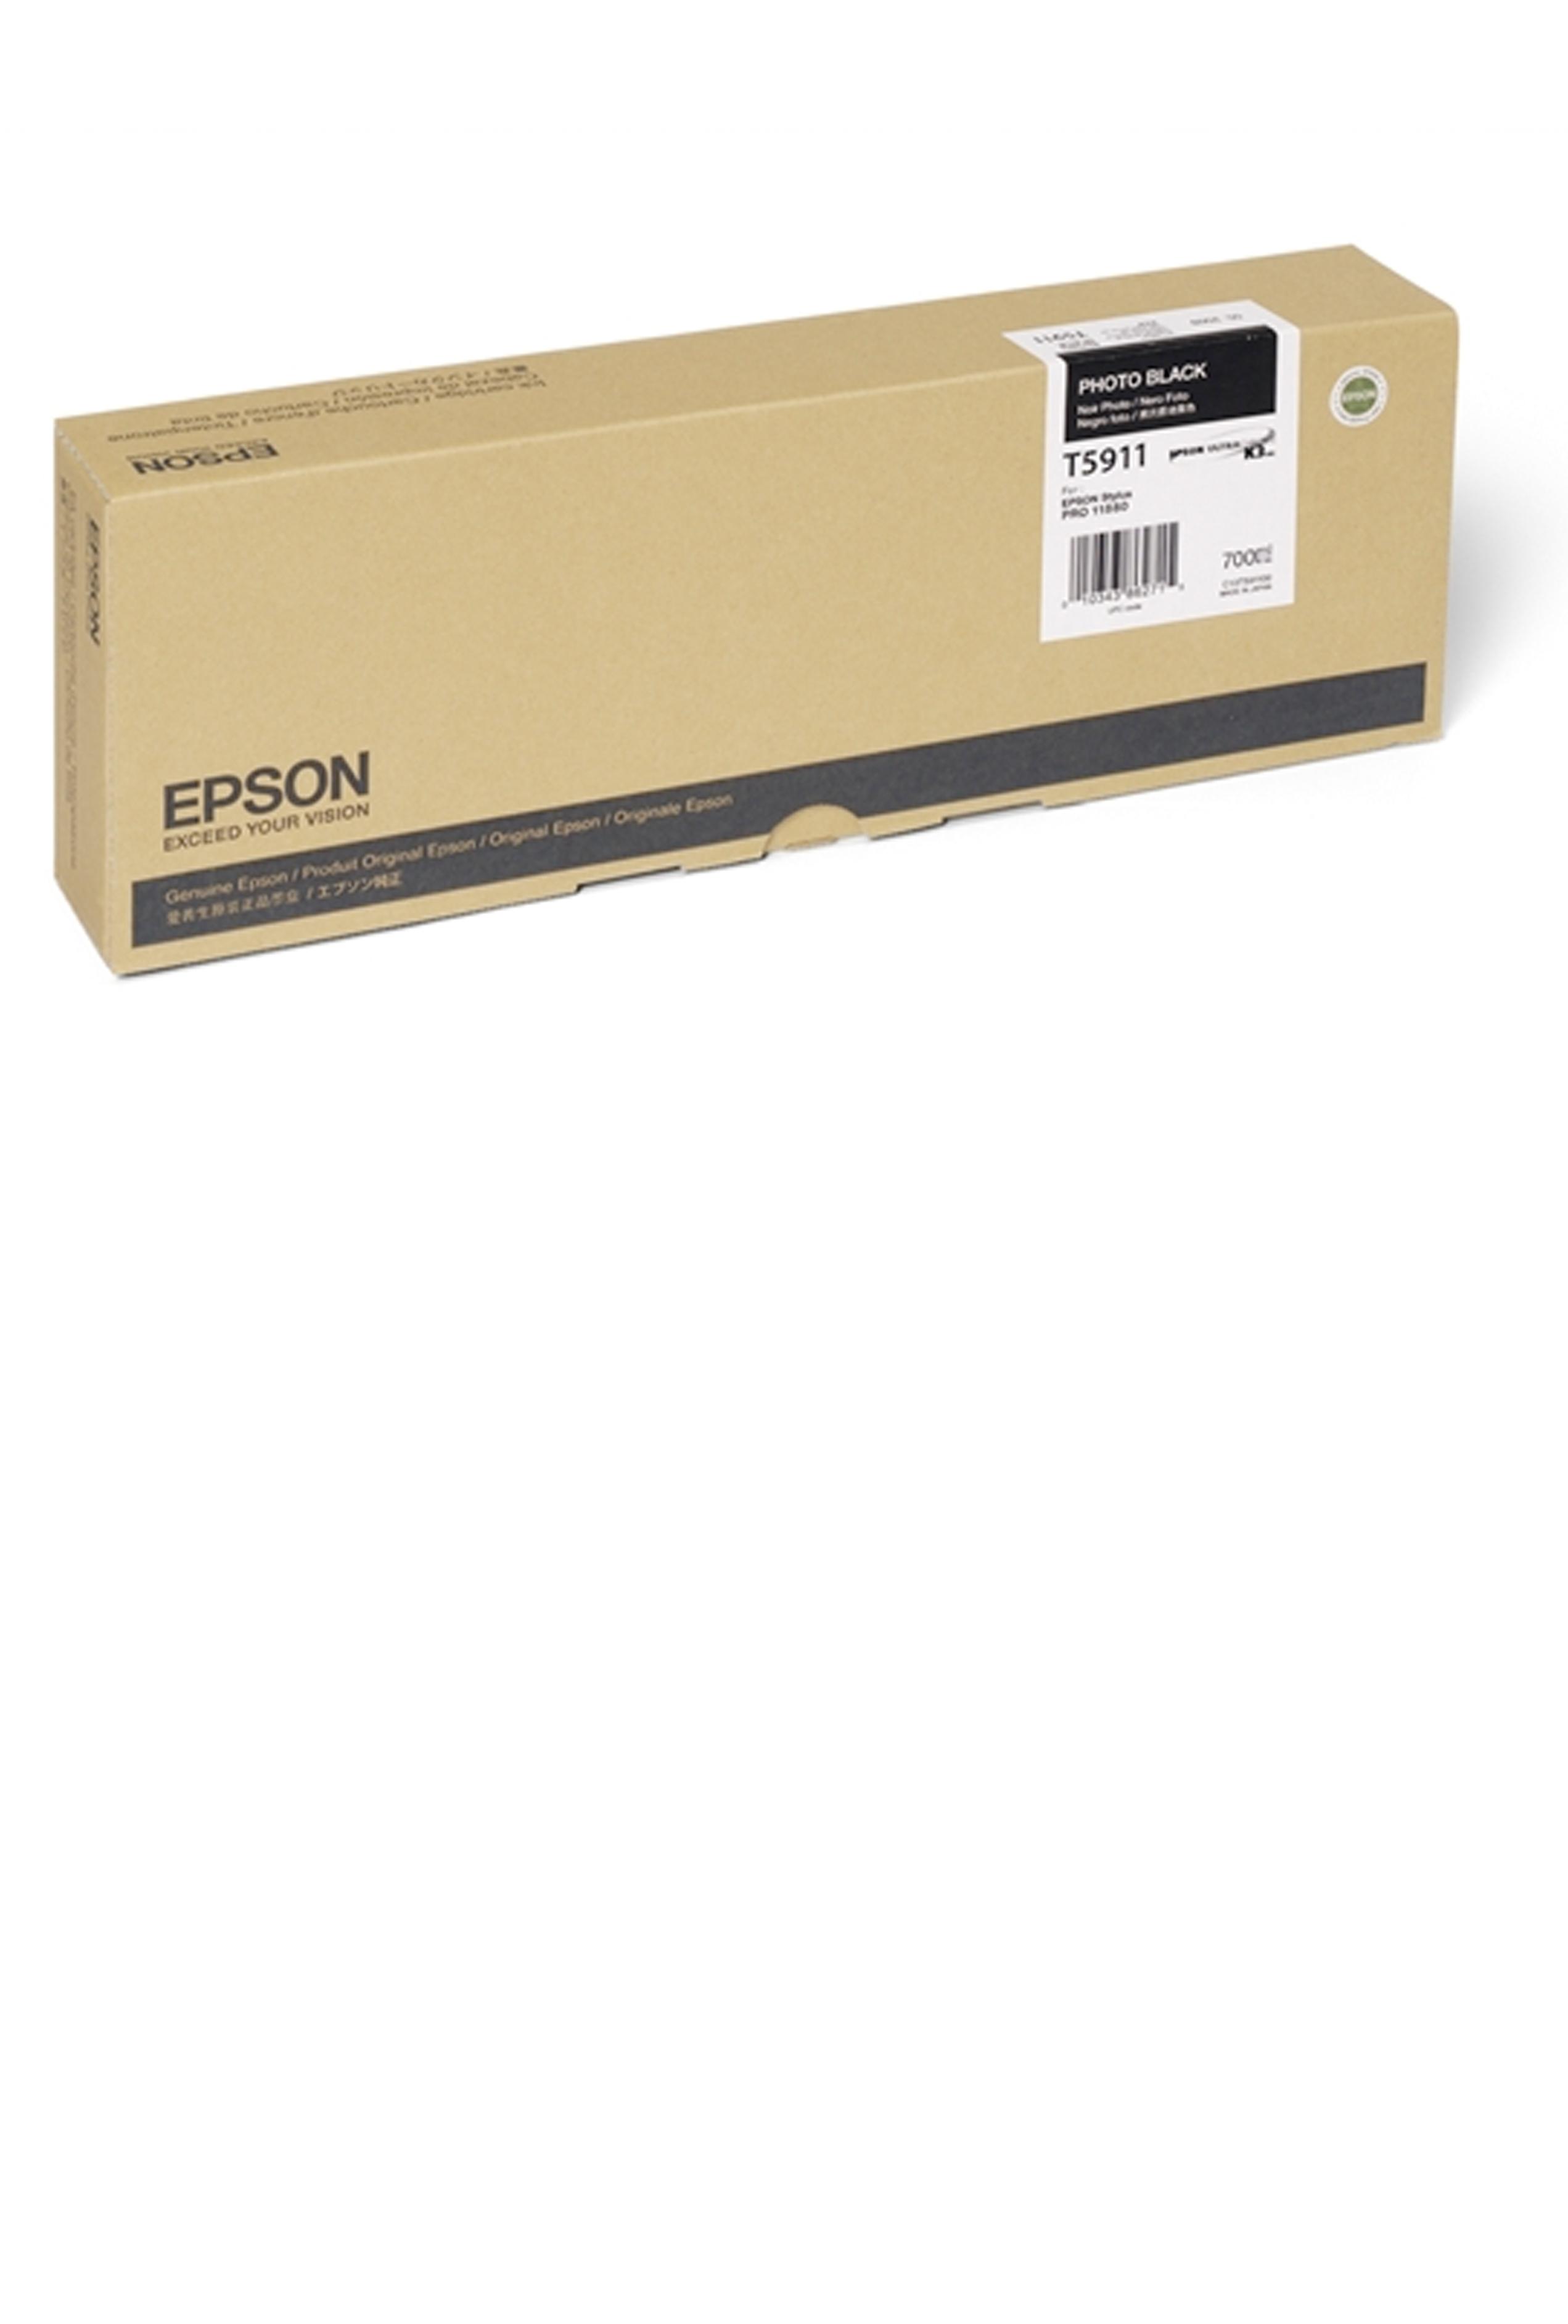 Epson EPSON HI PHOTO BLACK INK (700 ML) (T591100)